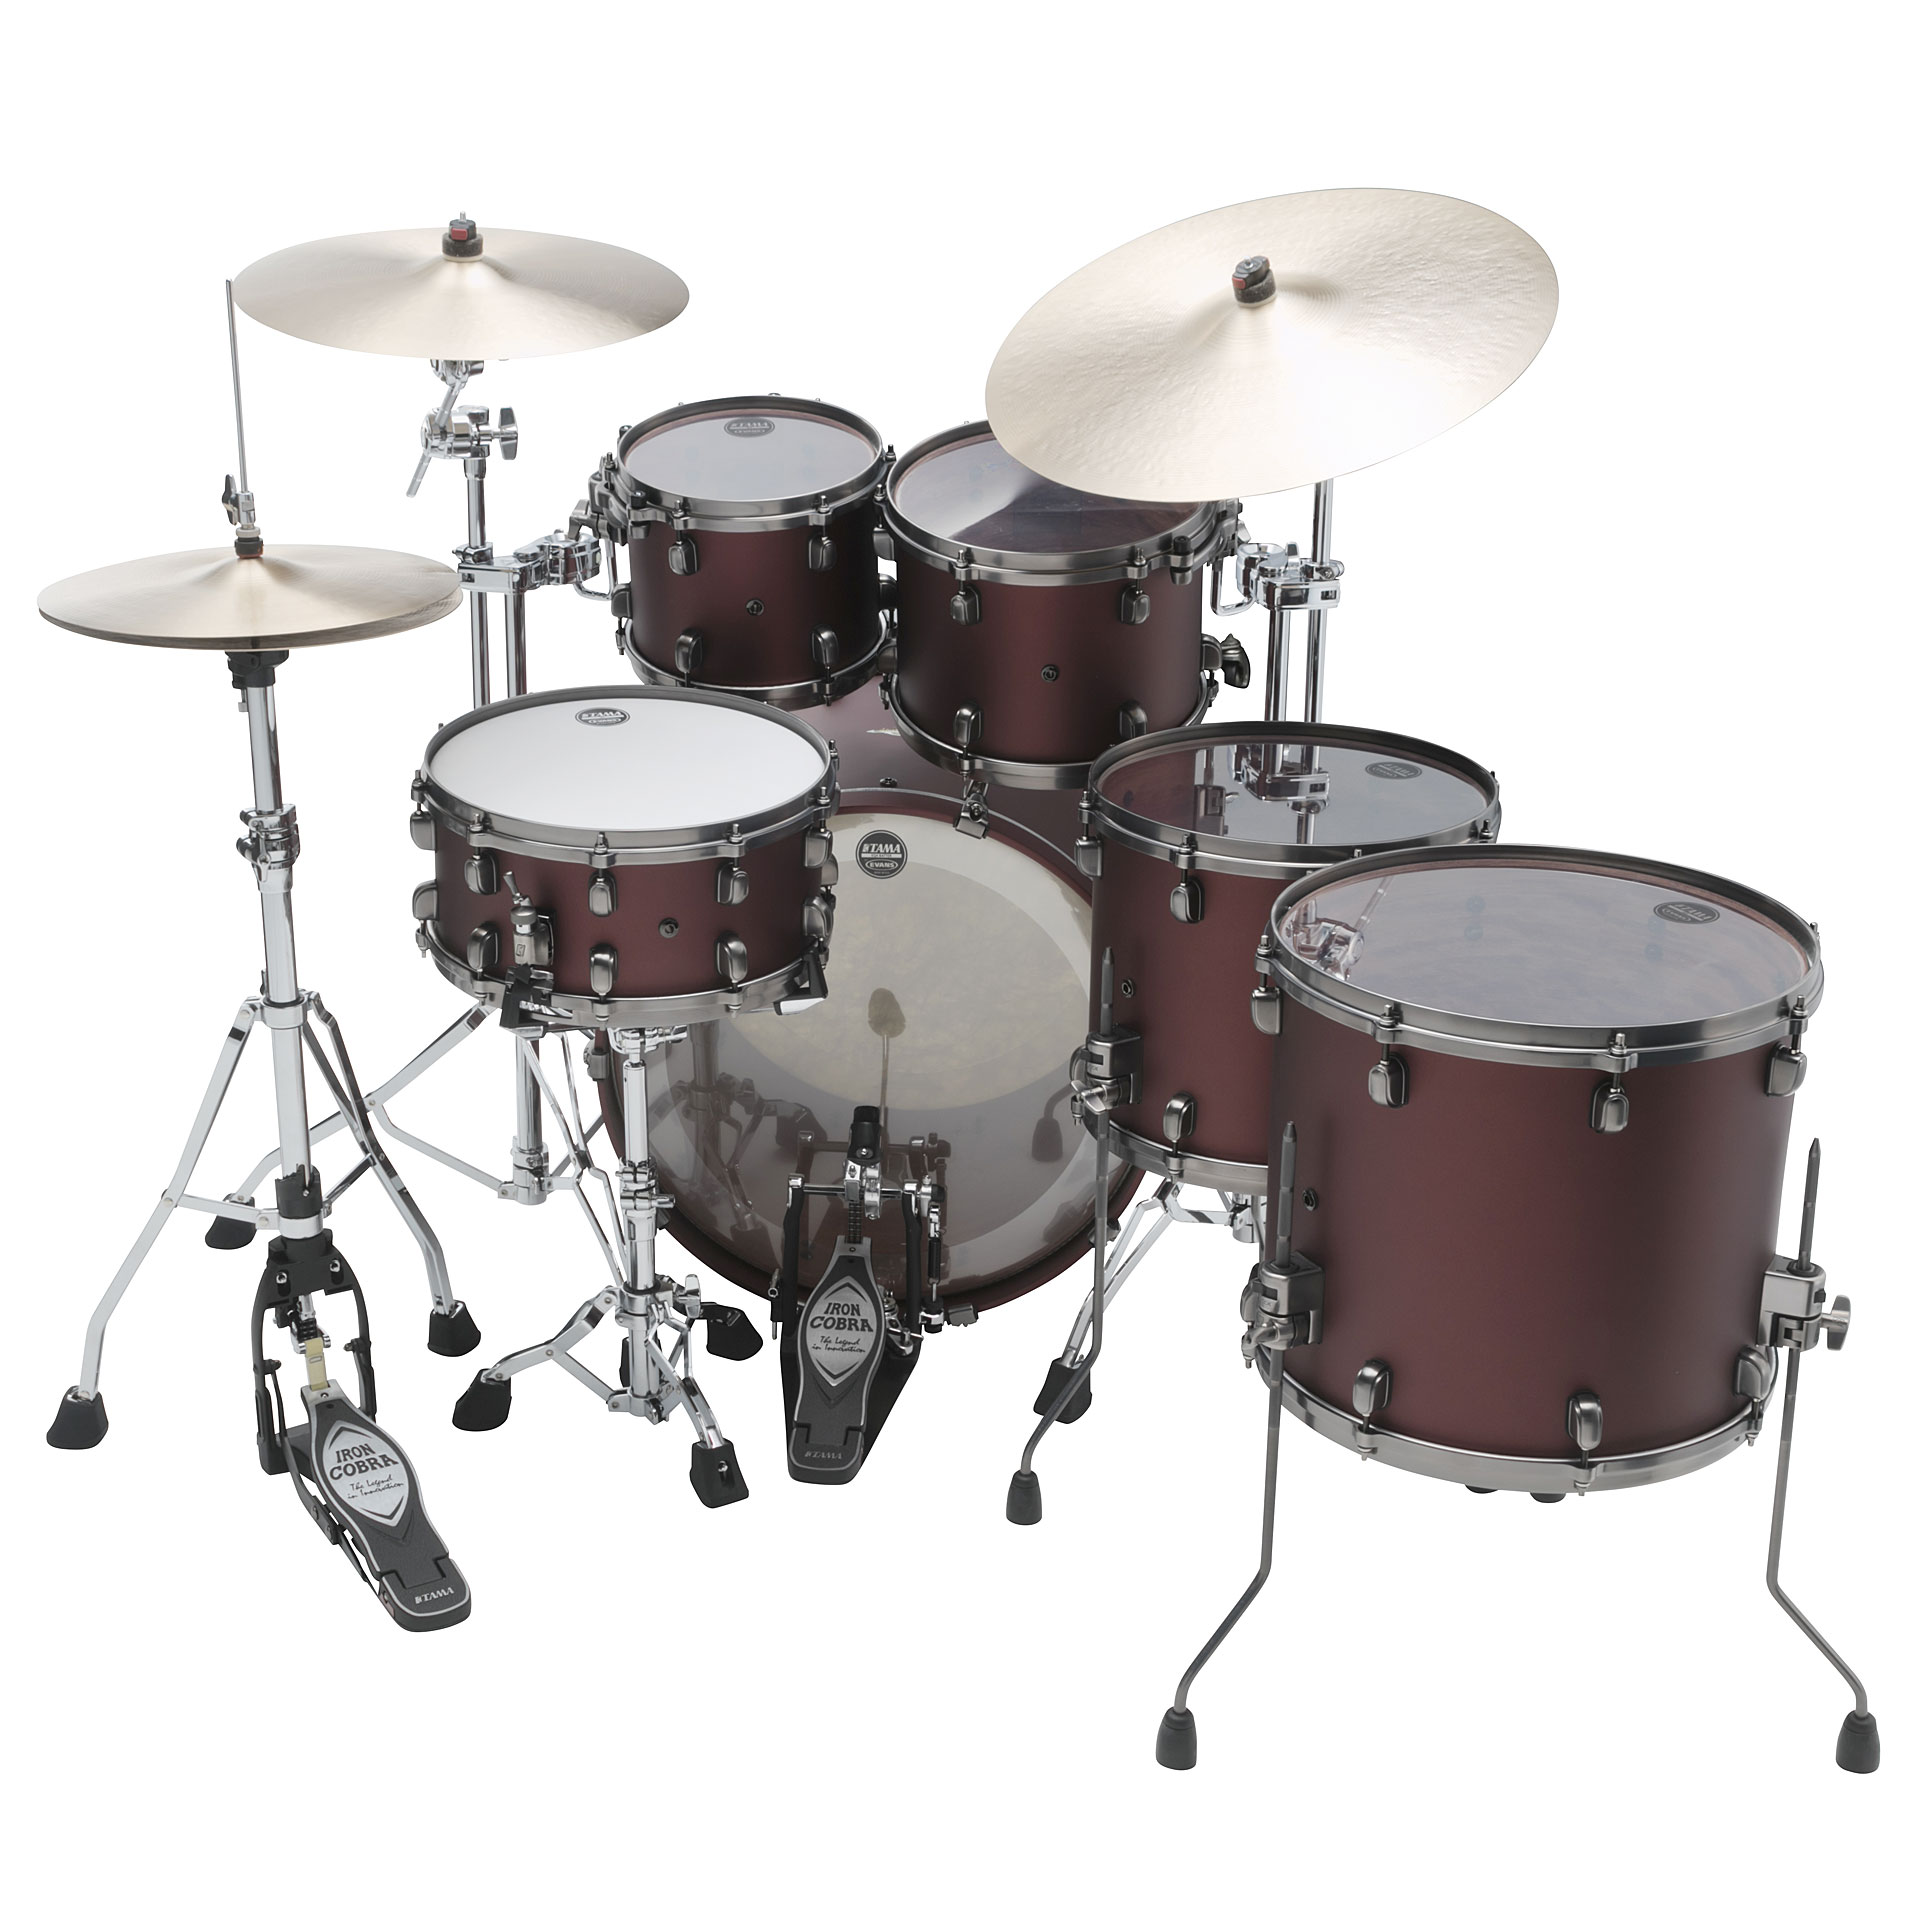 Tama starclassic bubinga 22 flat burgundy metallic drum kit for Zenhiser classic house drum sounds